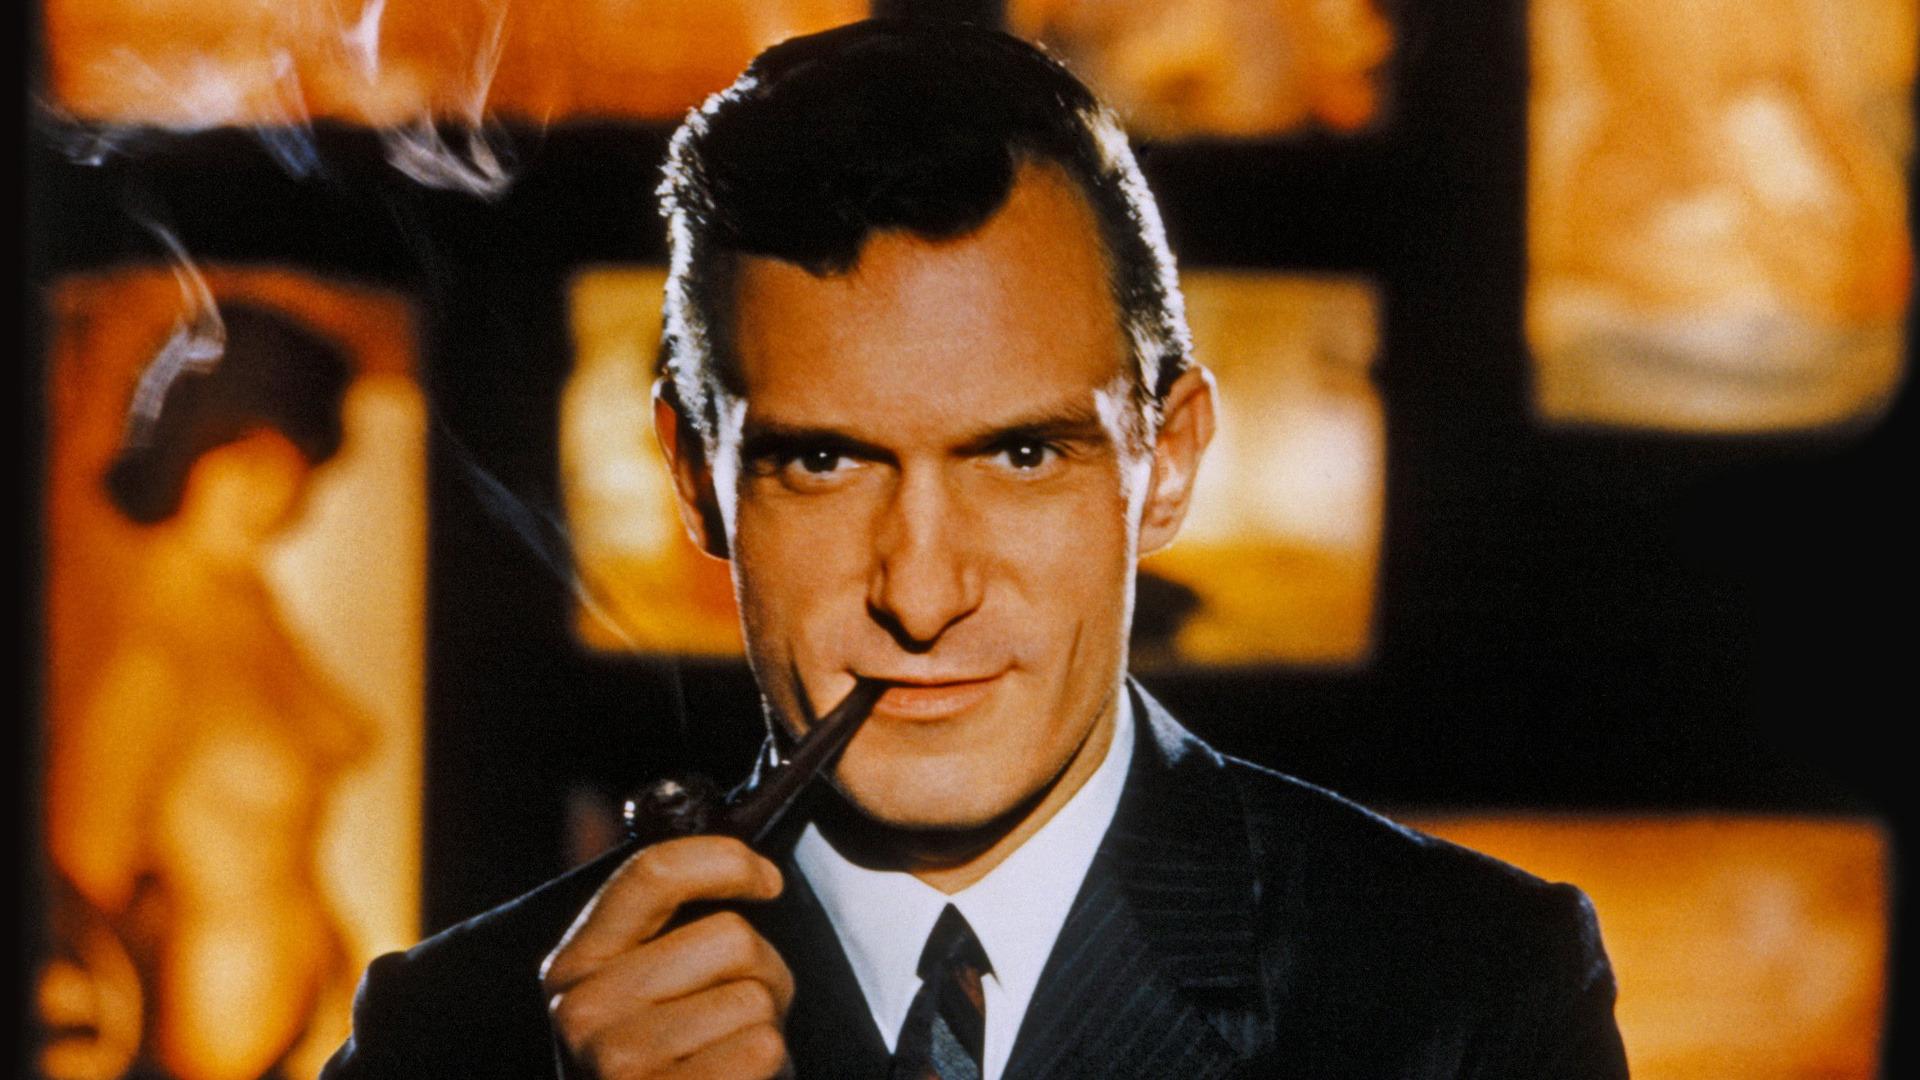 Show American Playboy: The Hugh Hefner Story